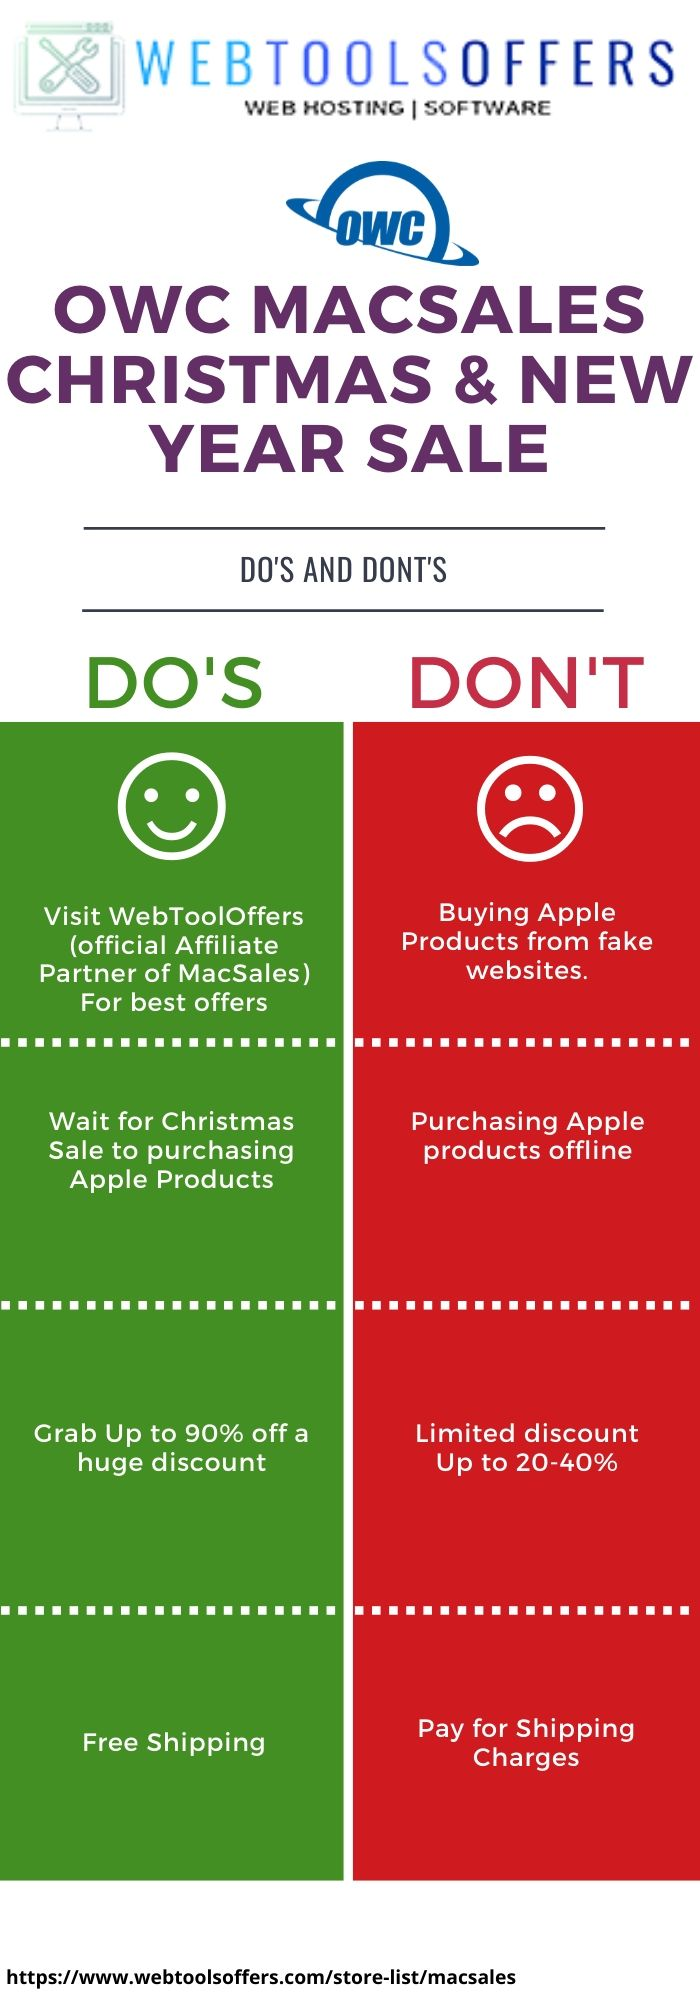 Macsales christmas & New Year Sale